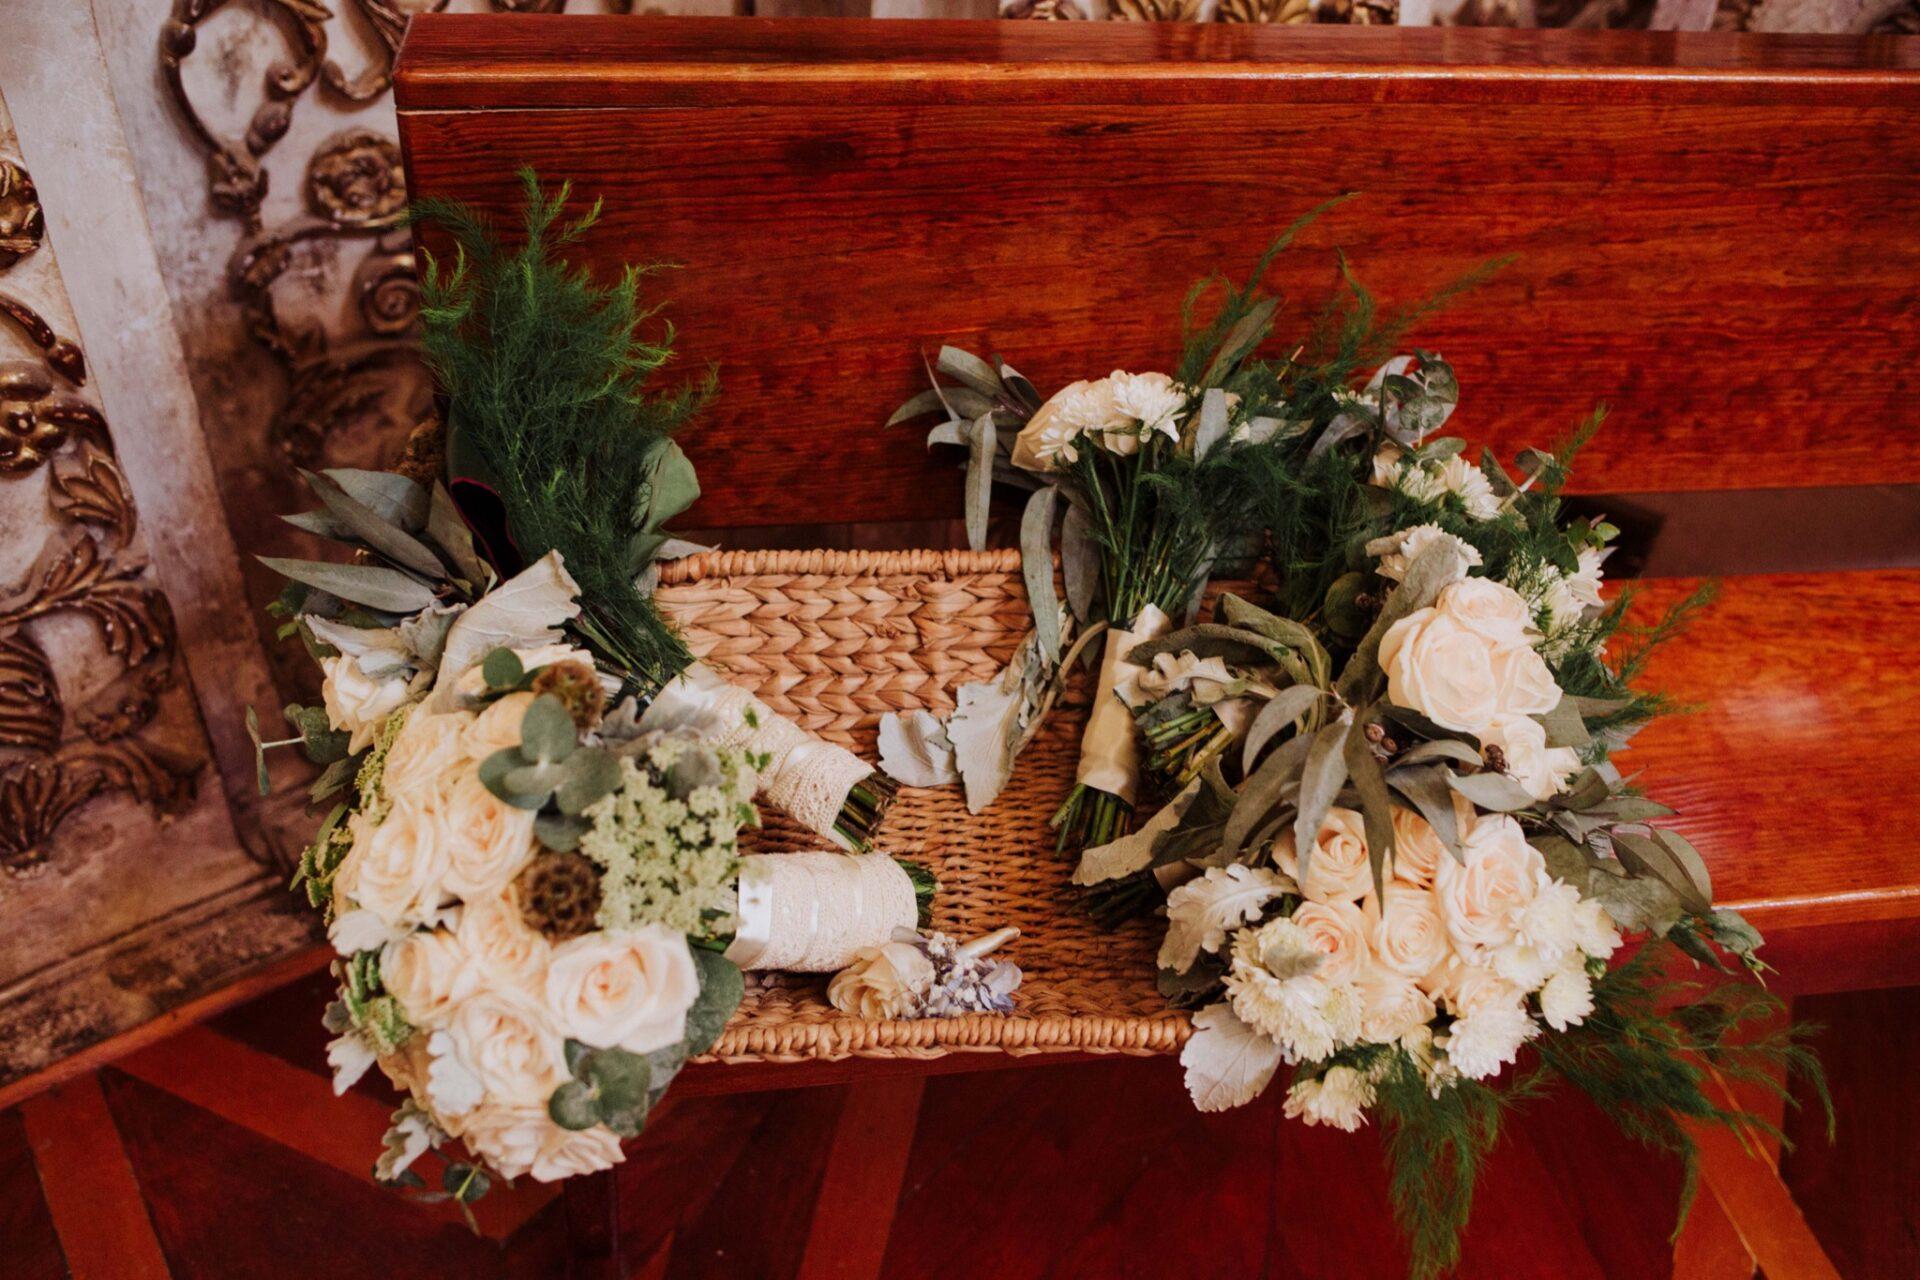 javier_noriega_fotografo_bodas_centro_platero_zacatecas_wedding_photographer2